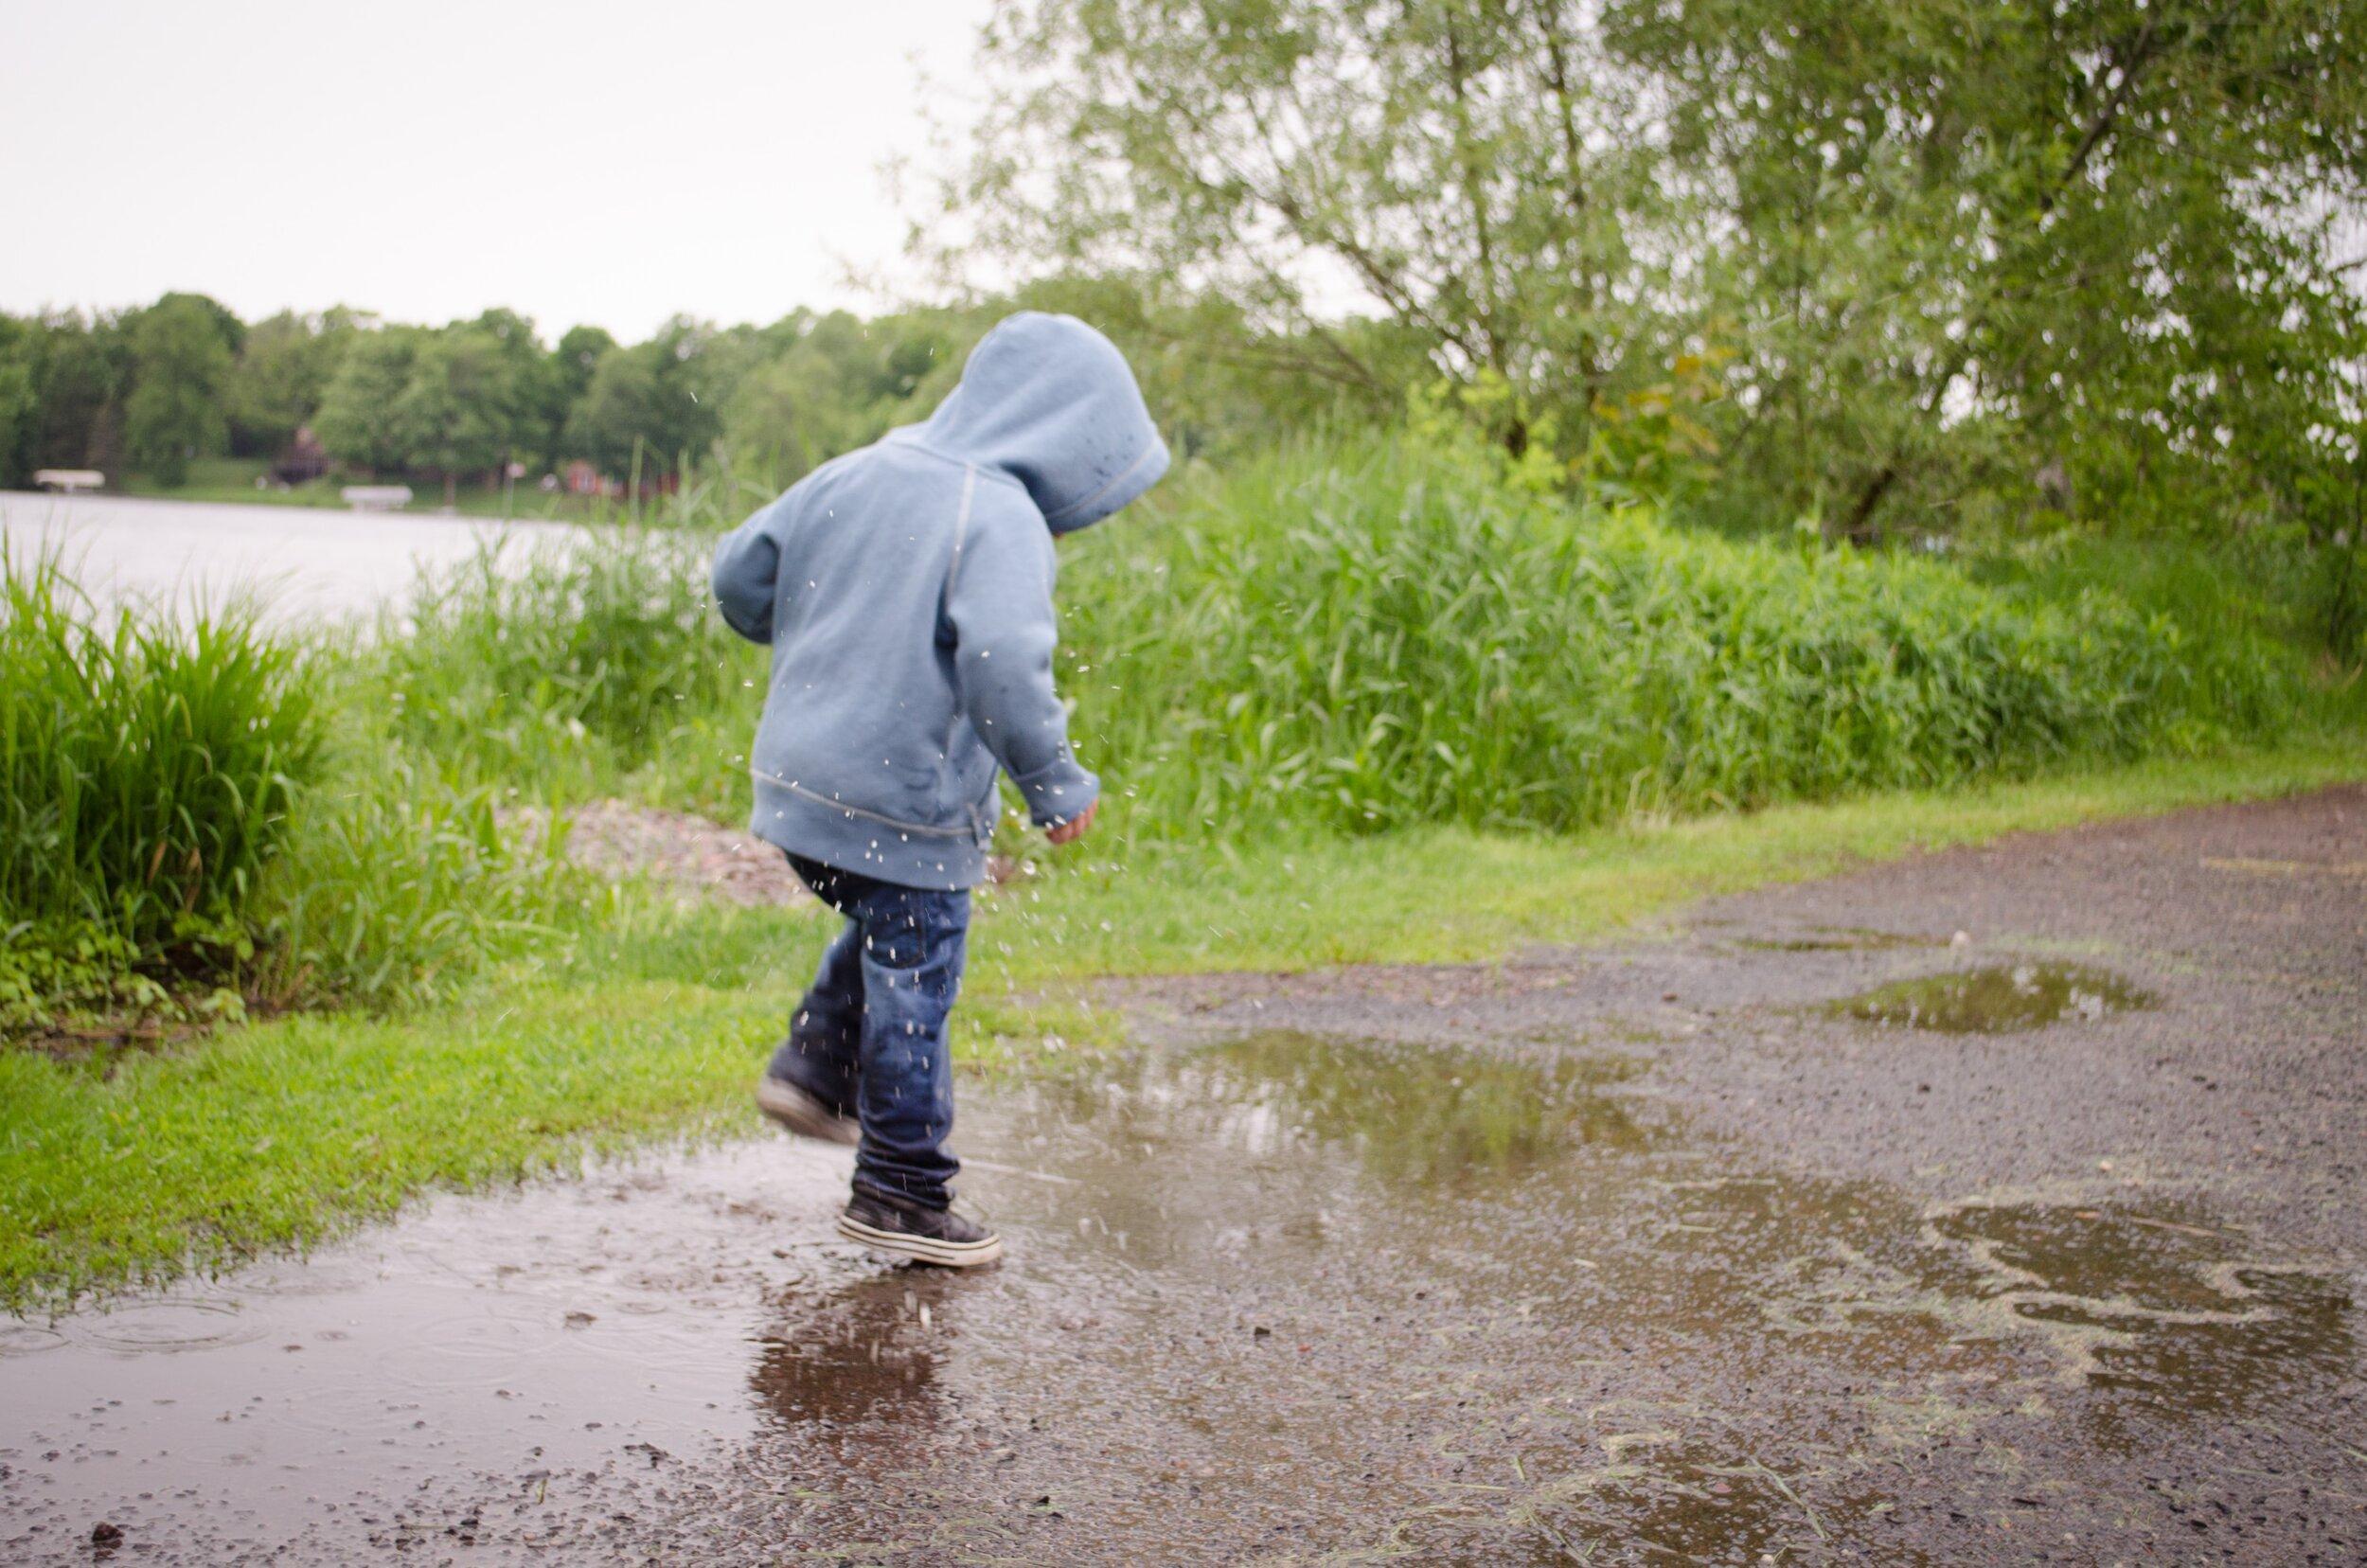 Glimsen-boy-puddle.jpg